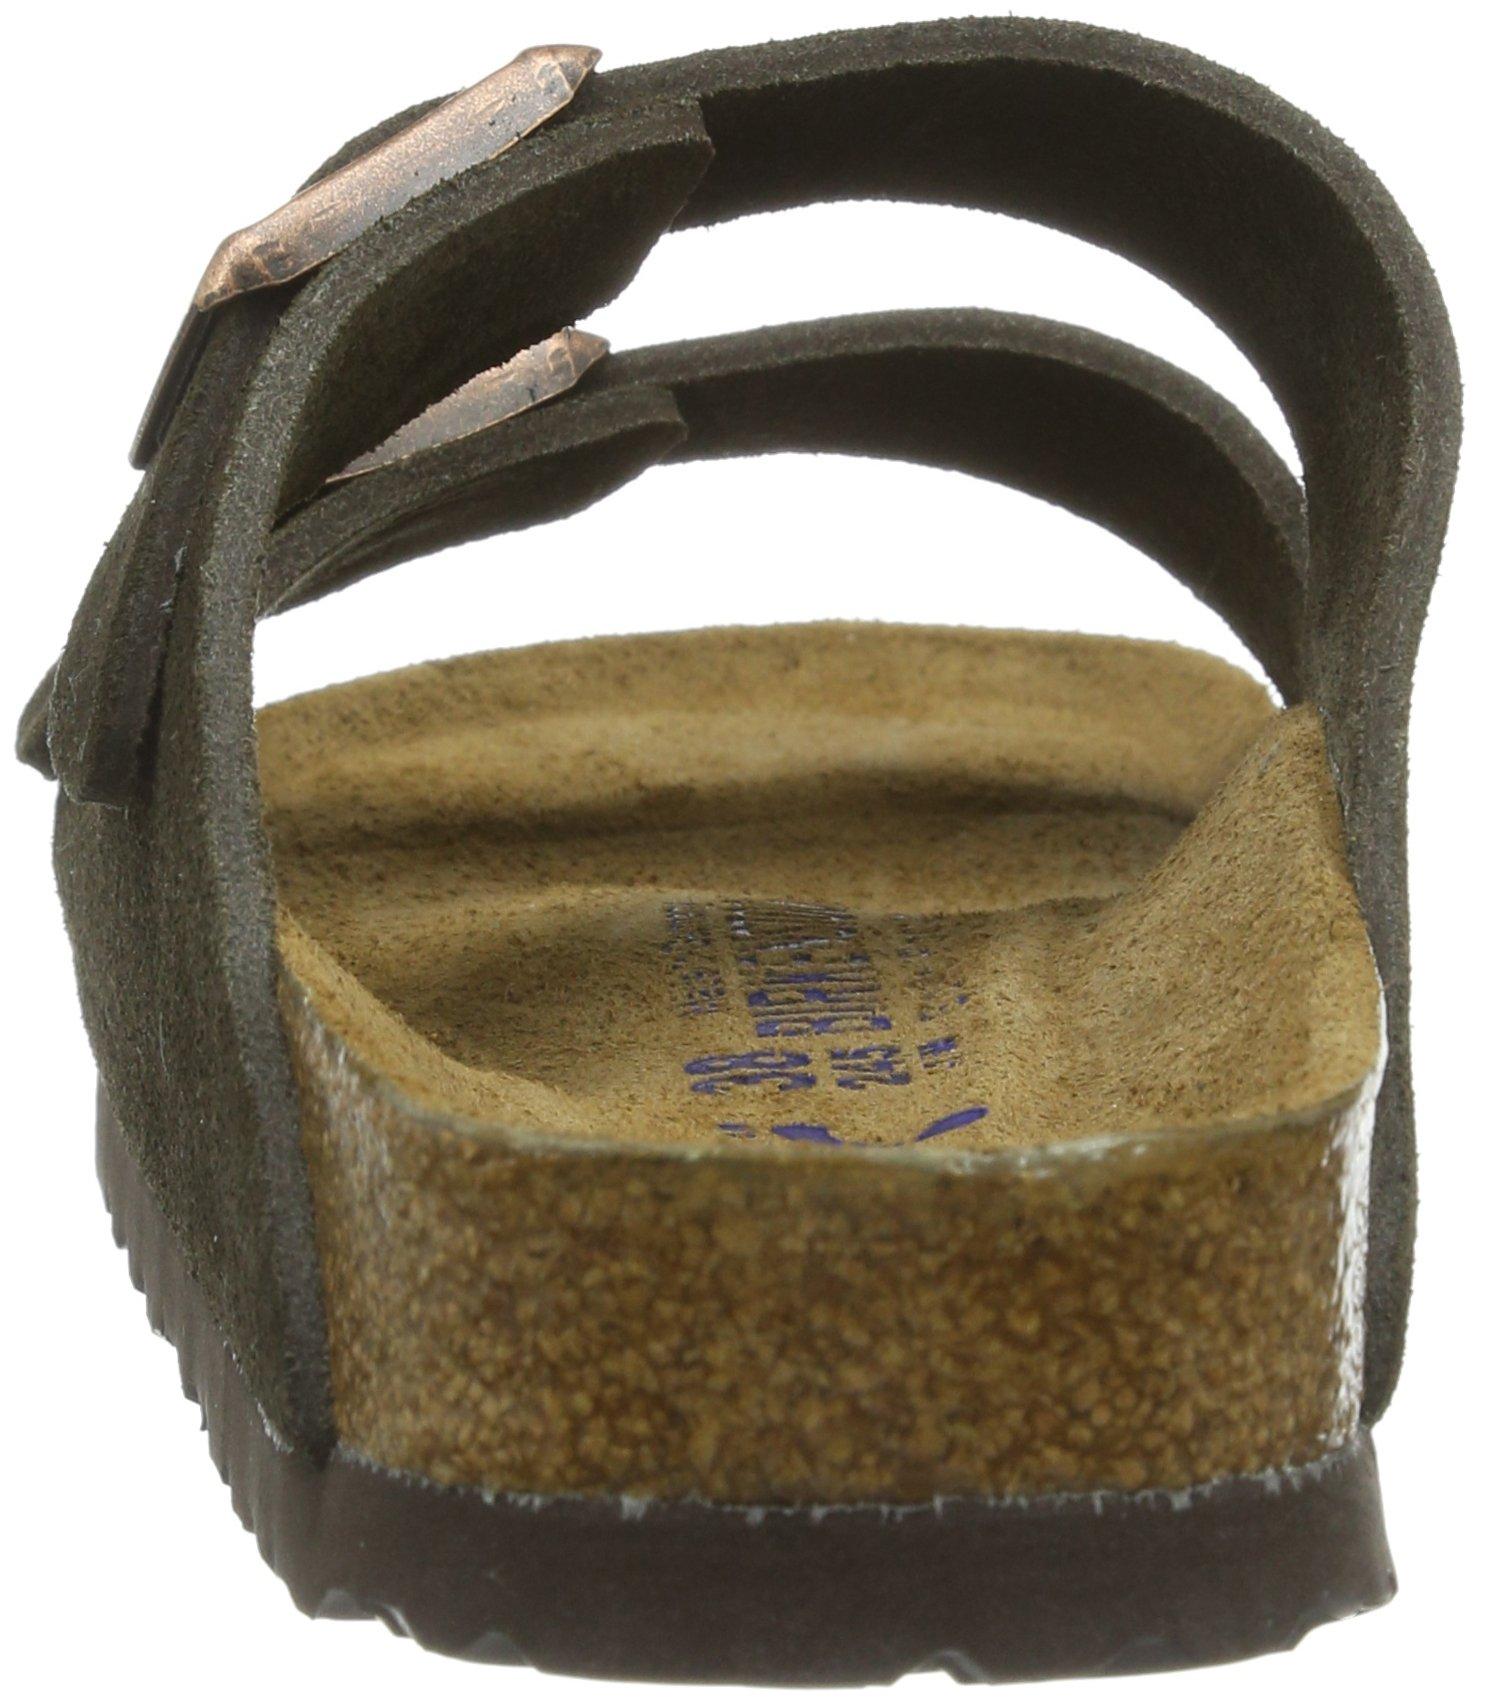 Birkenstock Women´s Arizona Mocha Suede Sandals 37 N EU N 951313 by Birkenstock (Image #2)